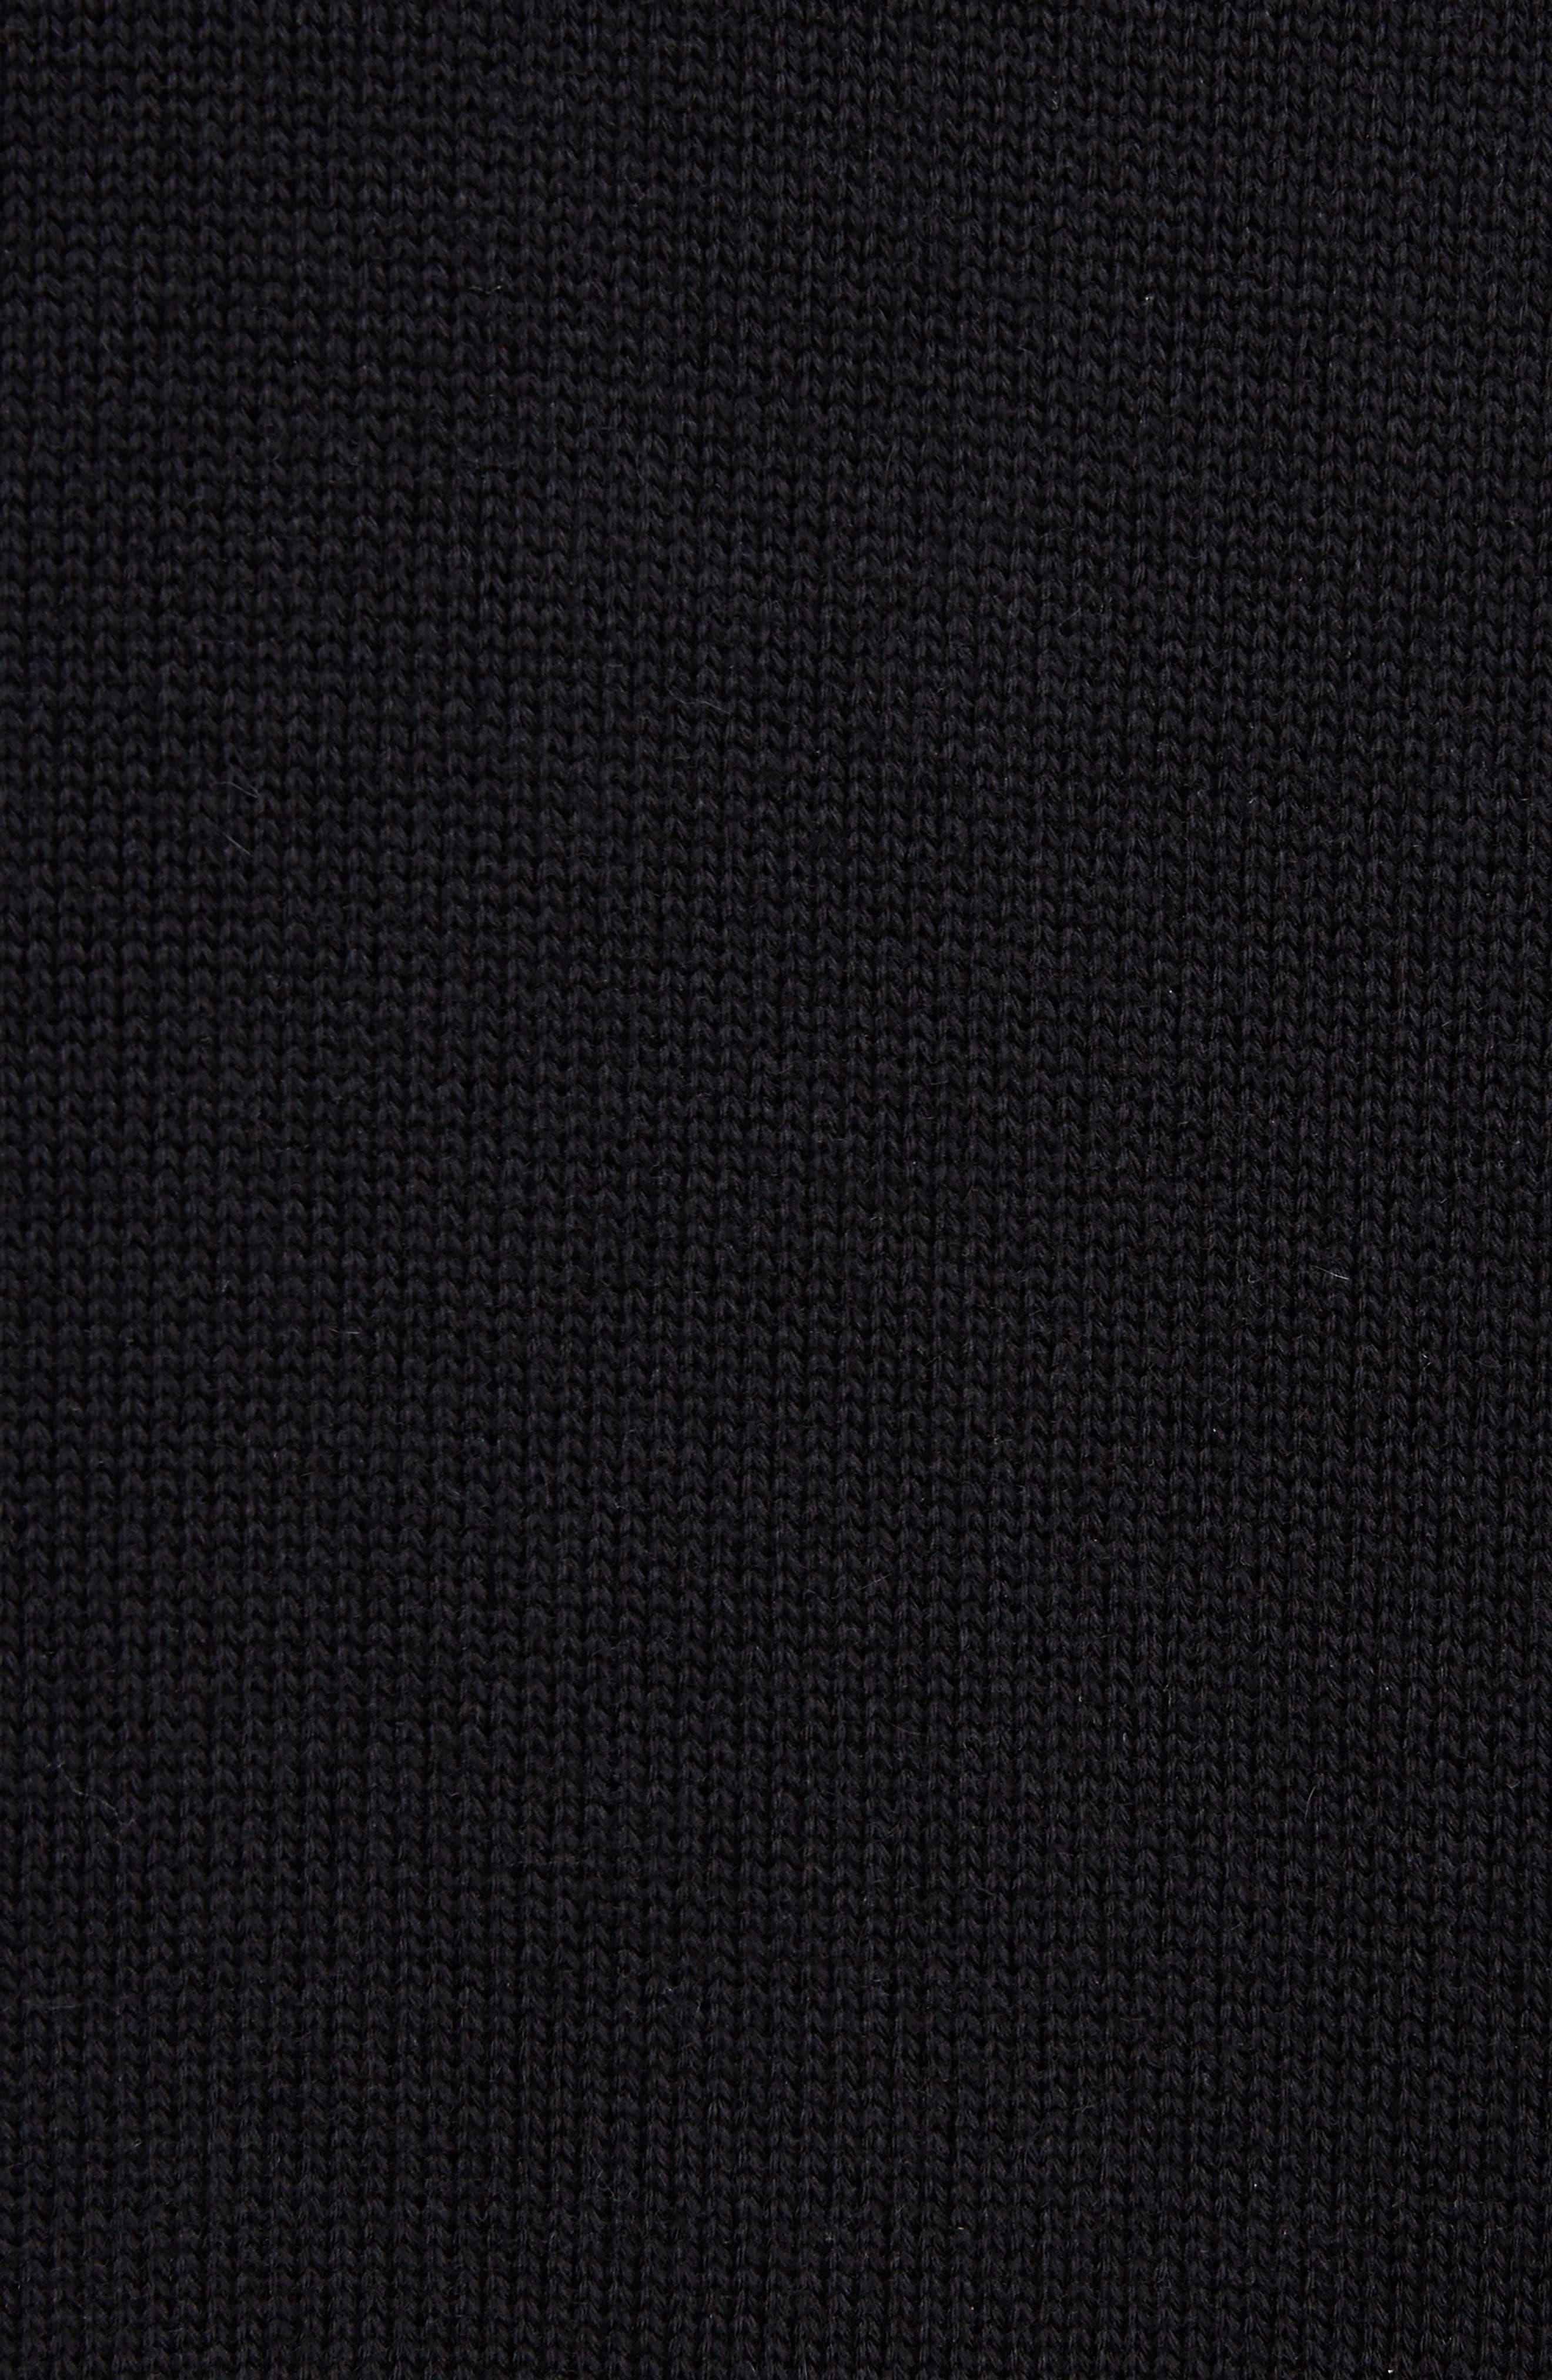 Leather Band Cotton & Cashmere Cardigan,                             Alternate thumbnail 5, color,